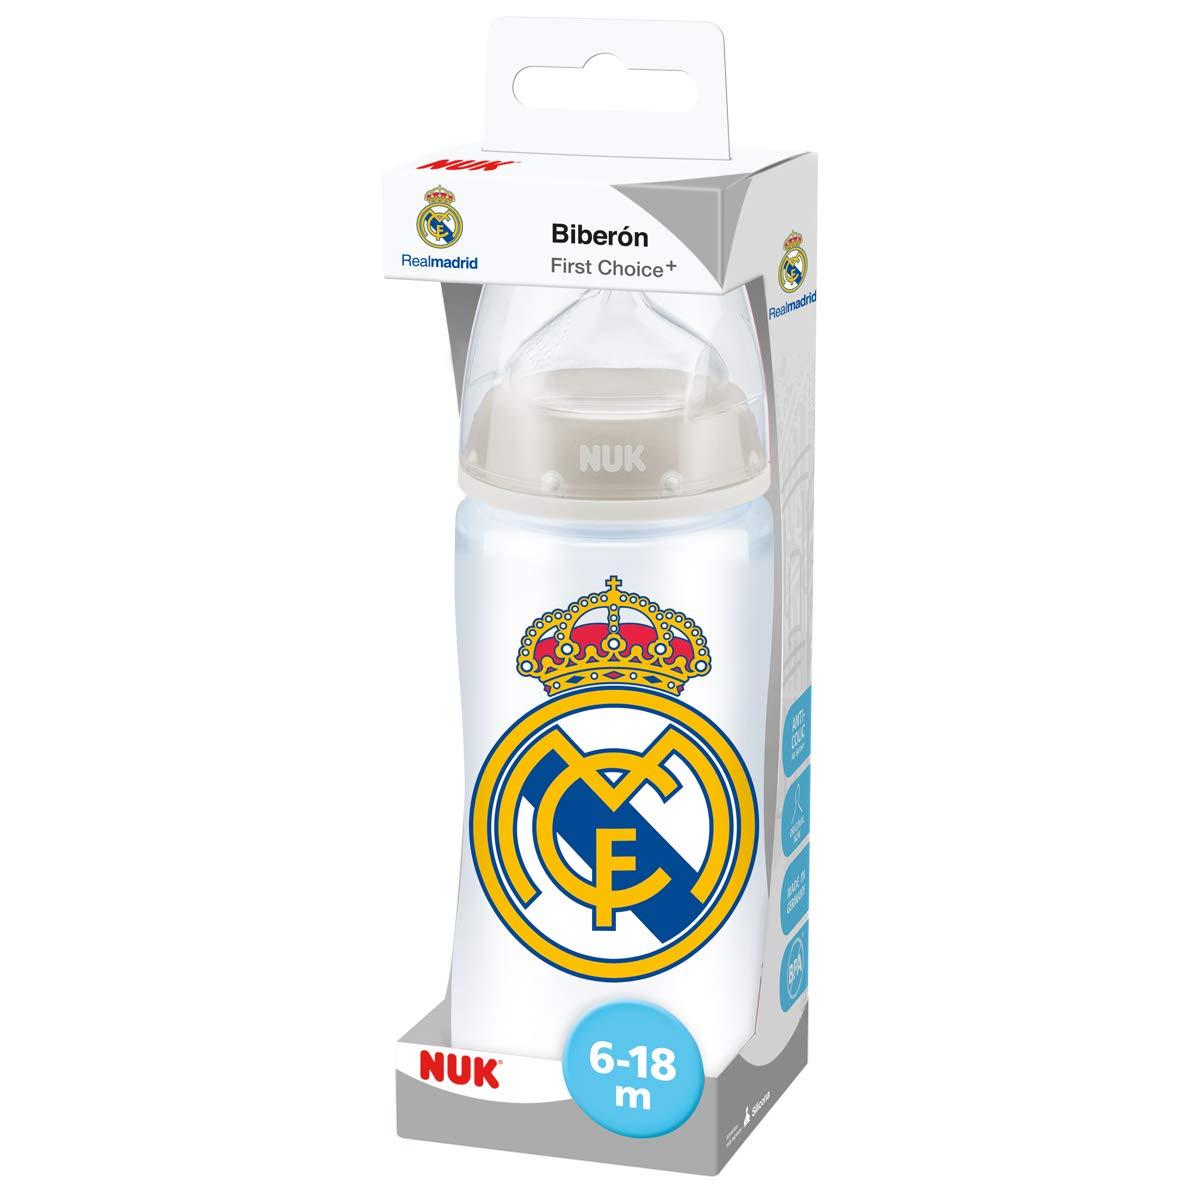 NUK First Choice + Biberón del Real Madrid de Silicona ...